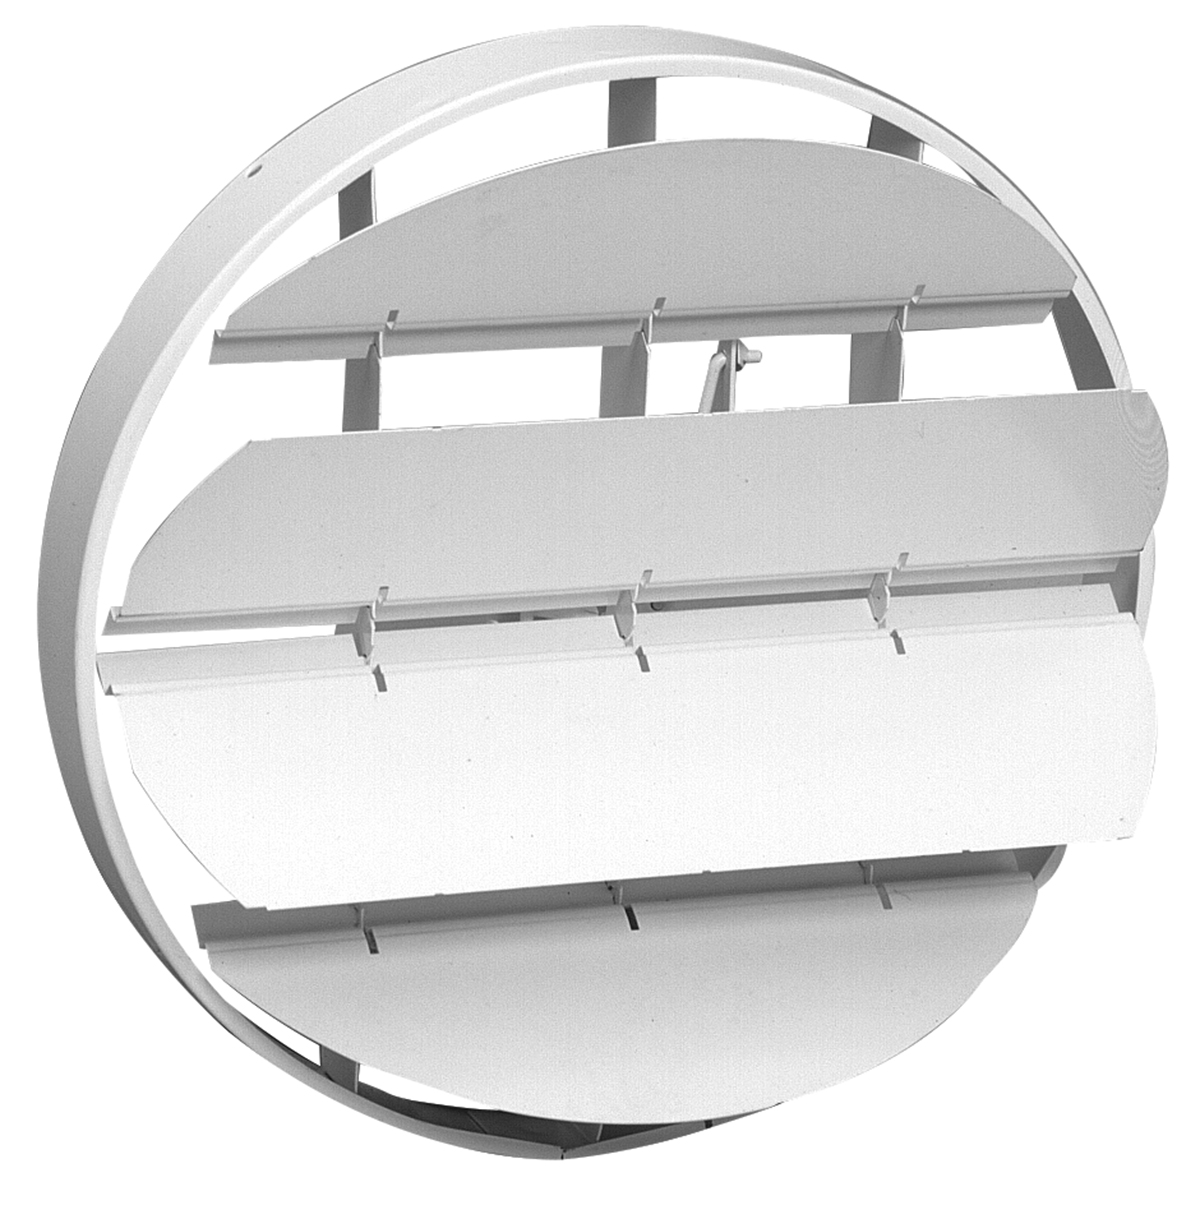 19 Steel Obd Duct Mount Damper For 20 Ceiling Diffuser